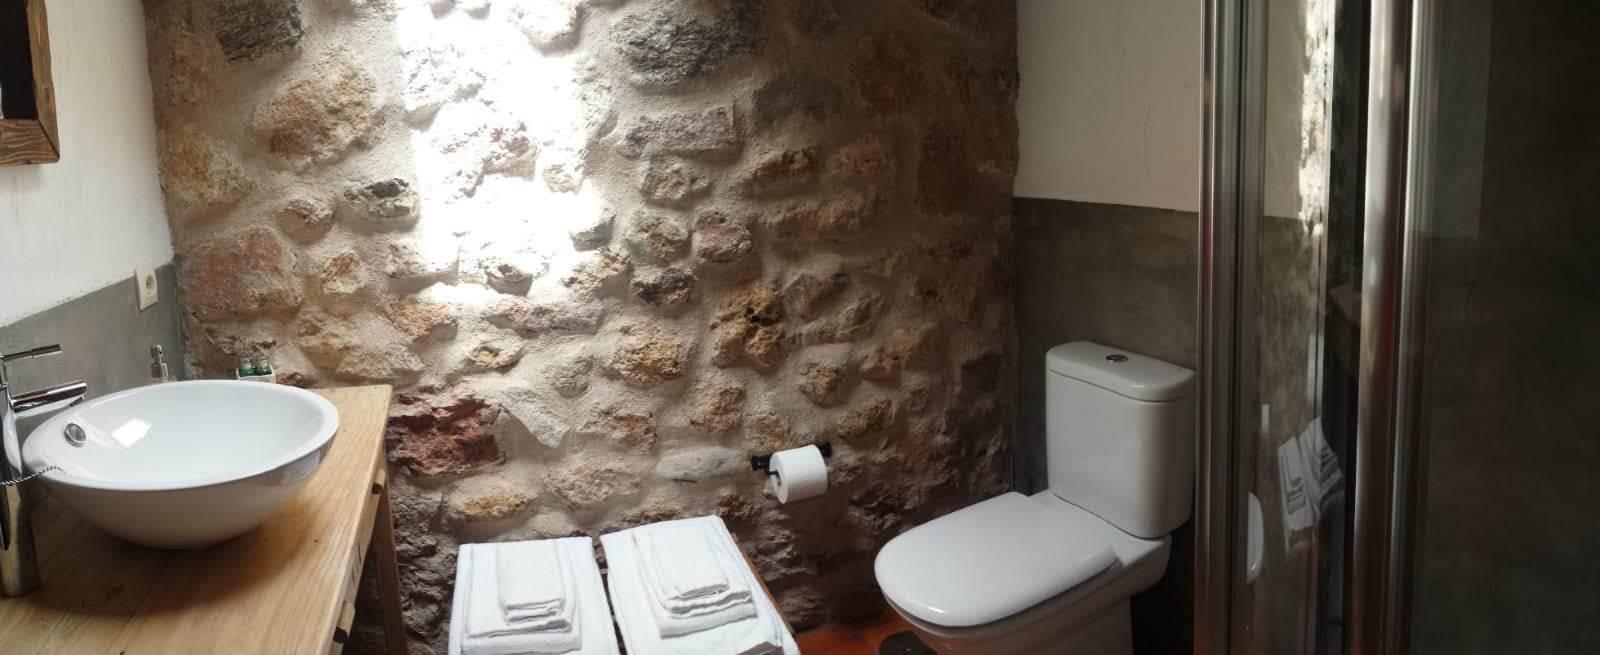 H.-morada-baño-02